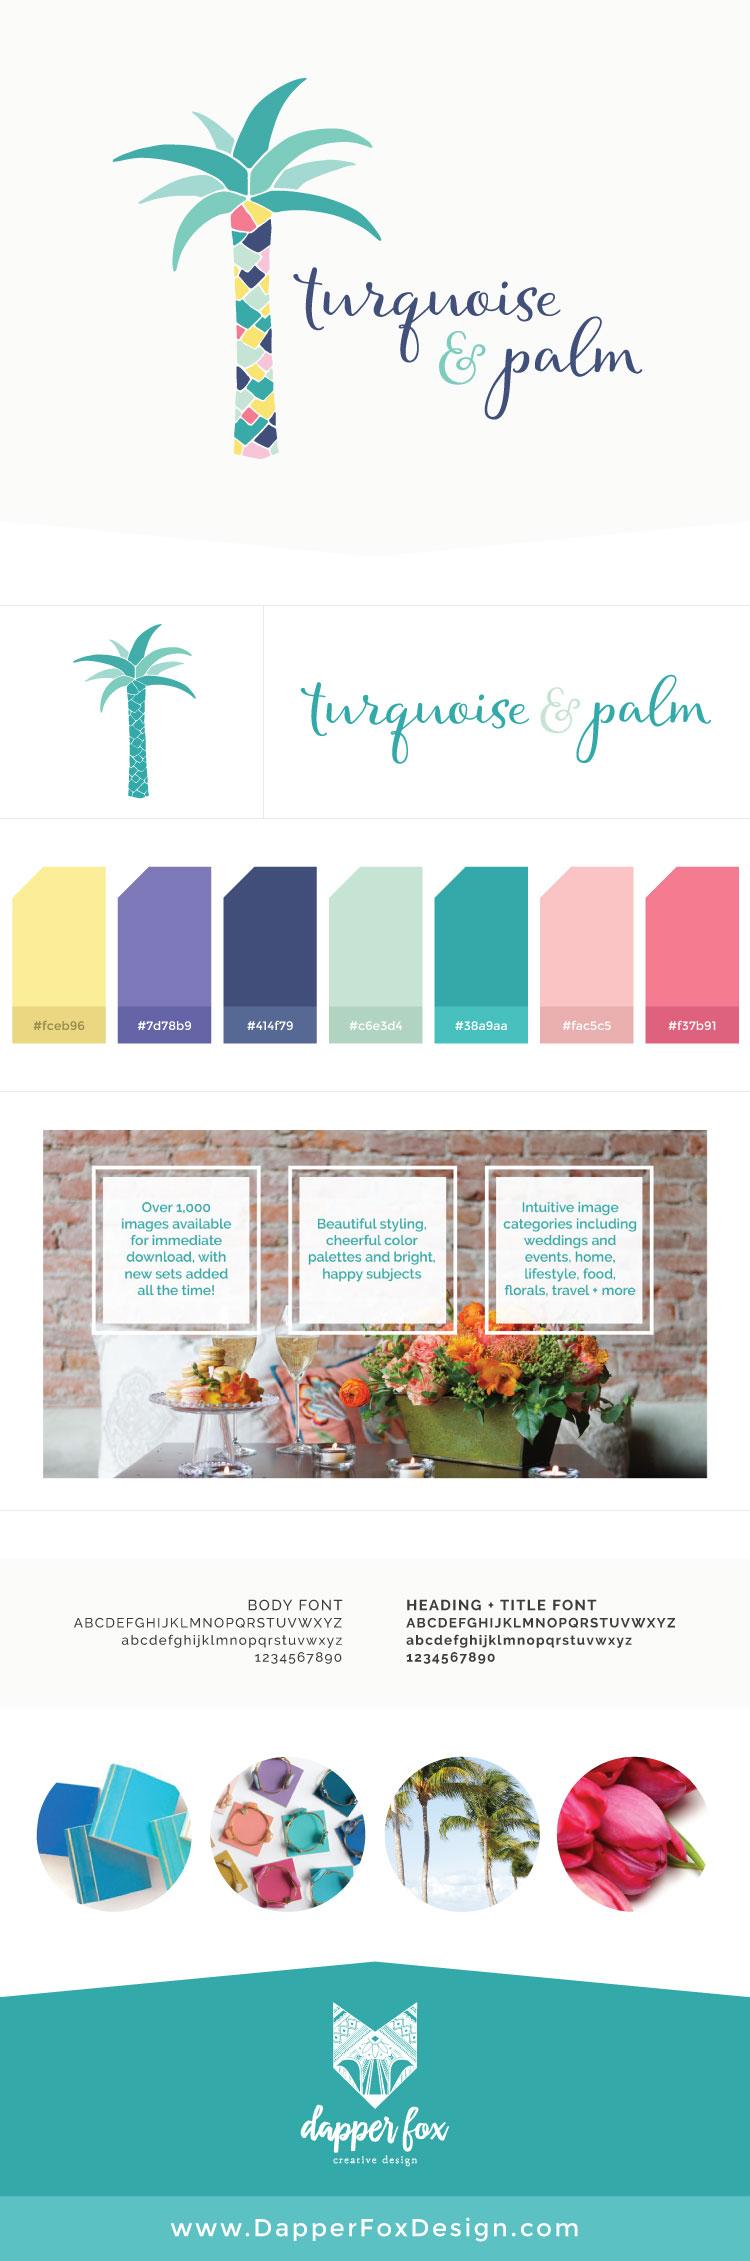 Turquoise and Palm Logo Design by Dapper Fox - Feminine, Modern Branding and Logo Design